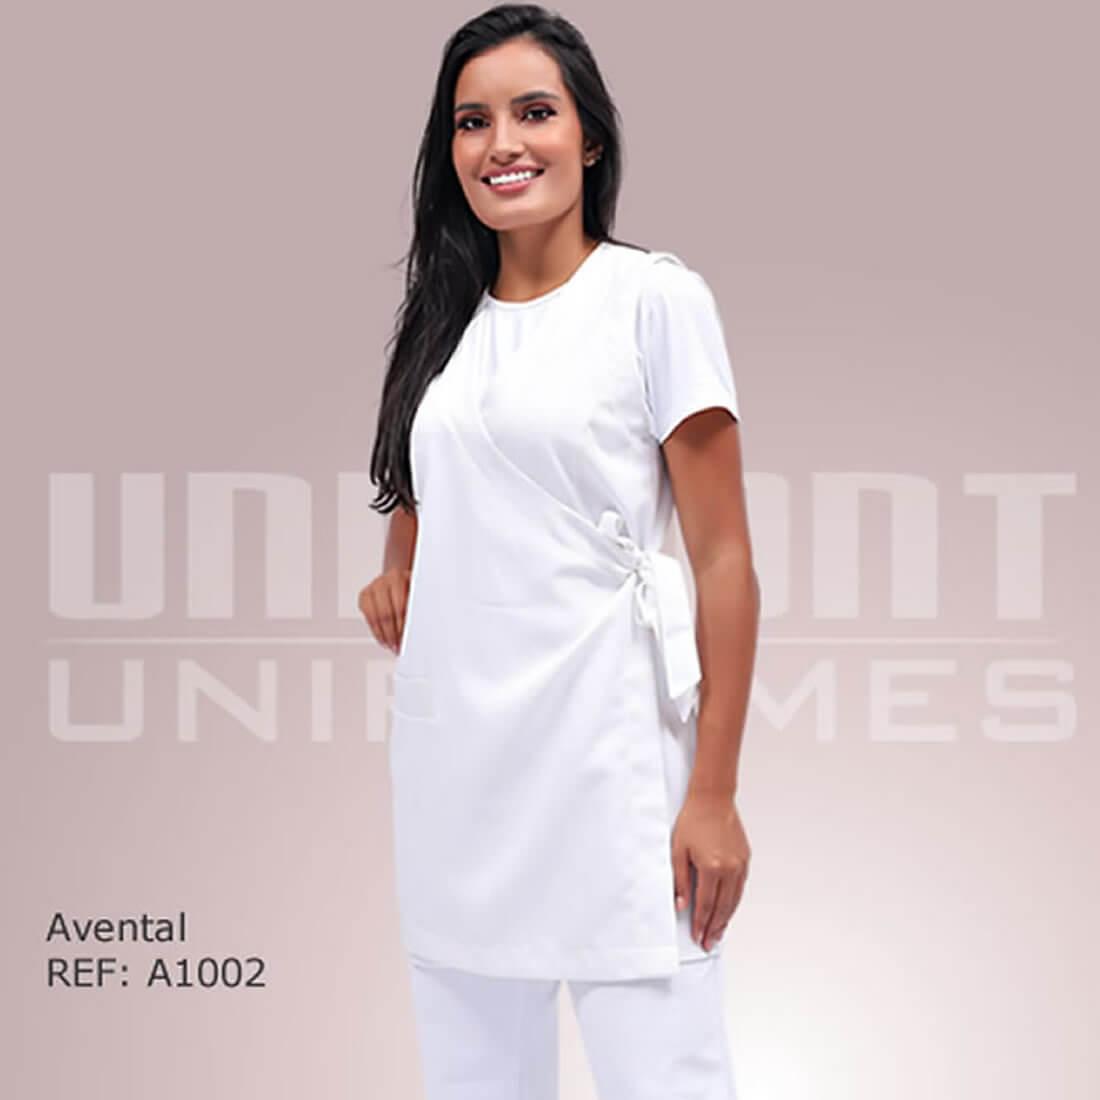 Uniforme Hospitalar Feminino Unimont